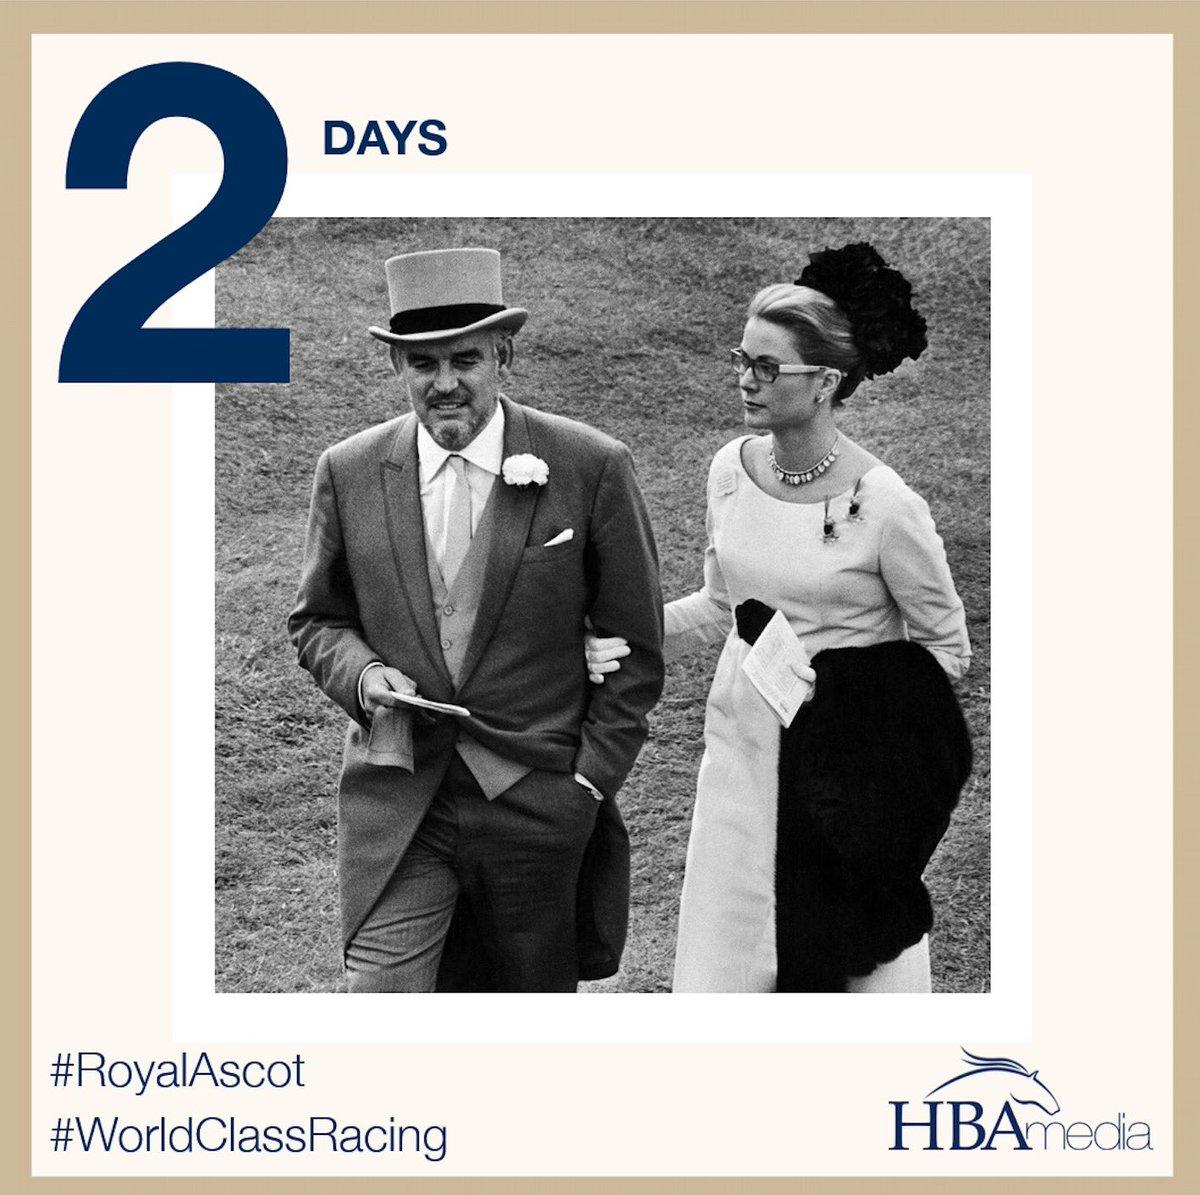 Prince Rainier III and Grace Kelly, Princess of Monaco enjoying a day at Royal Ascot #RoyalAscot #worldclassracing #princerainieriii #princessofmonaco #gracekellypic.twitter.com/wYRj8qJRj8